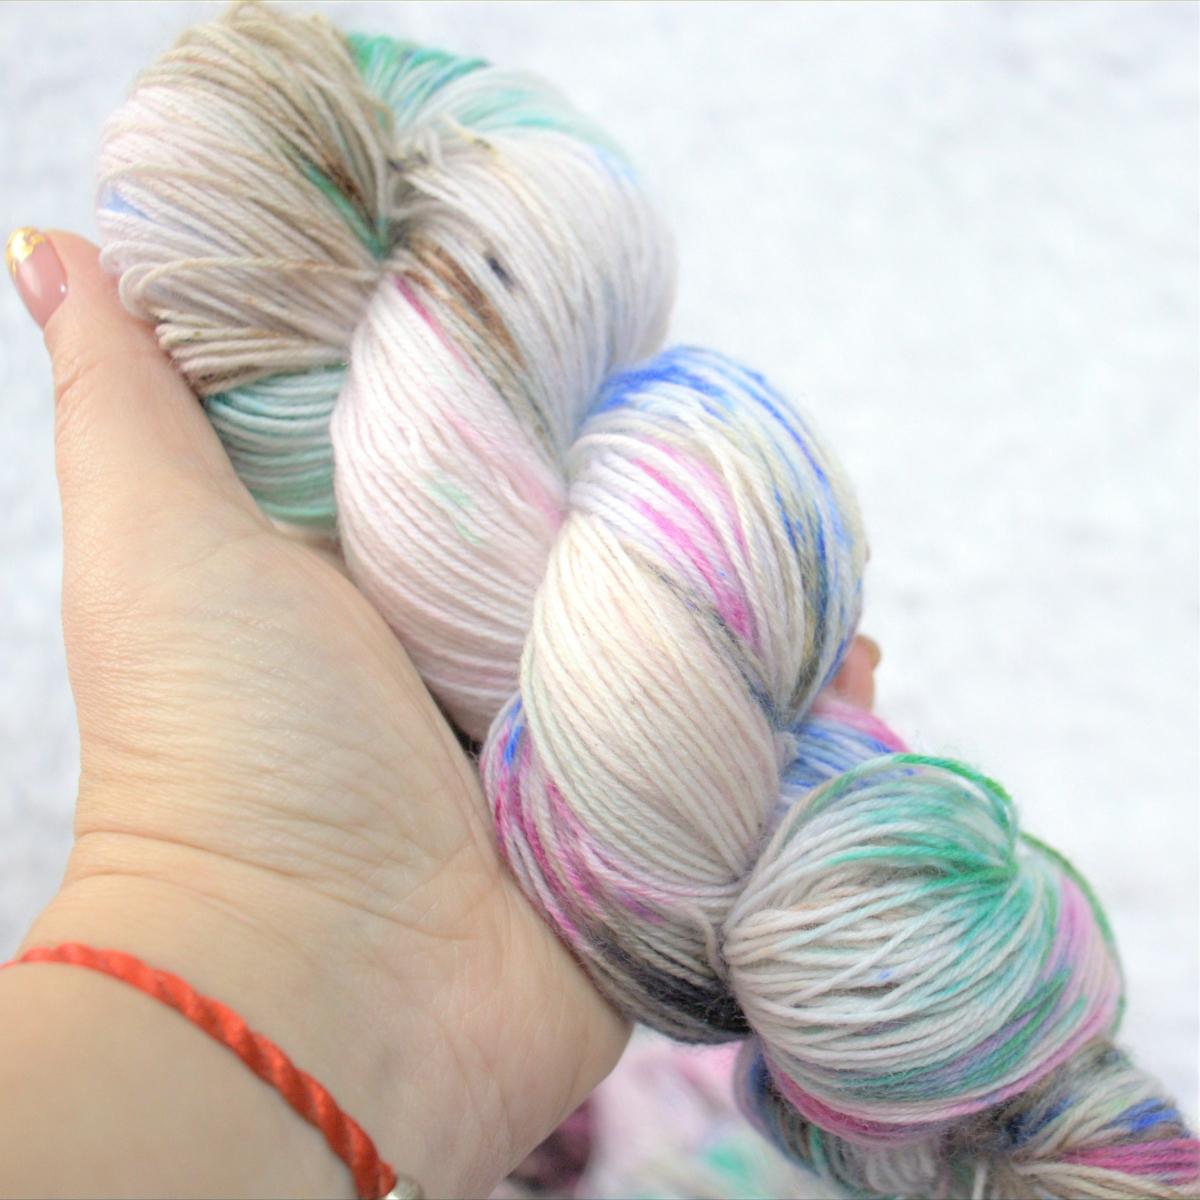 woodico.pro hand dyed yarn 048 3 1200x1200 - Hand dyed yarn / 048